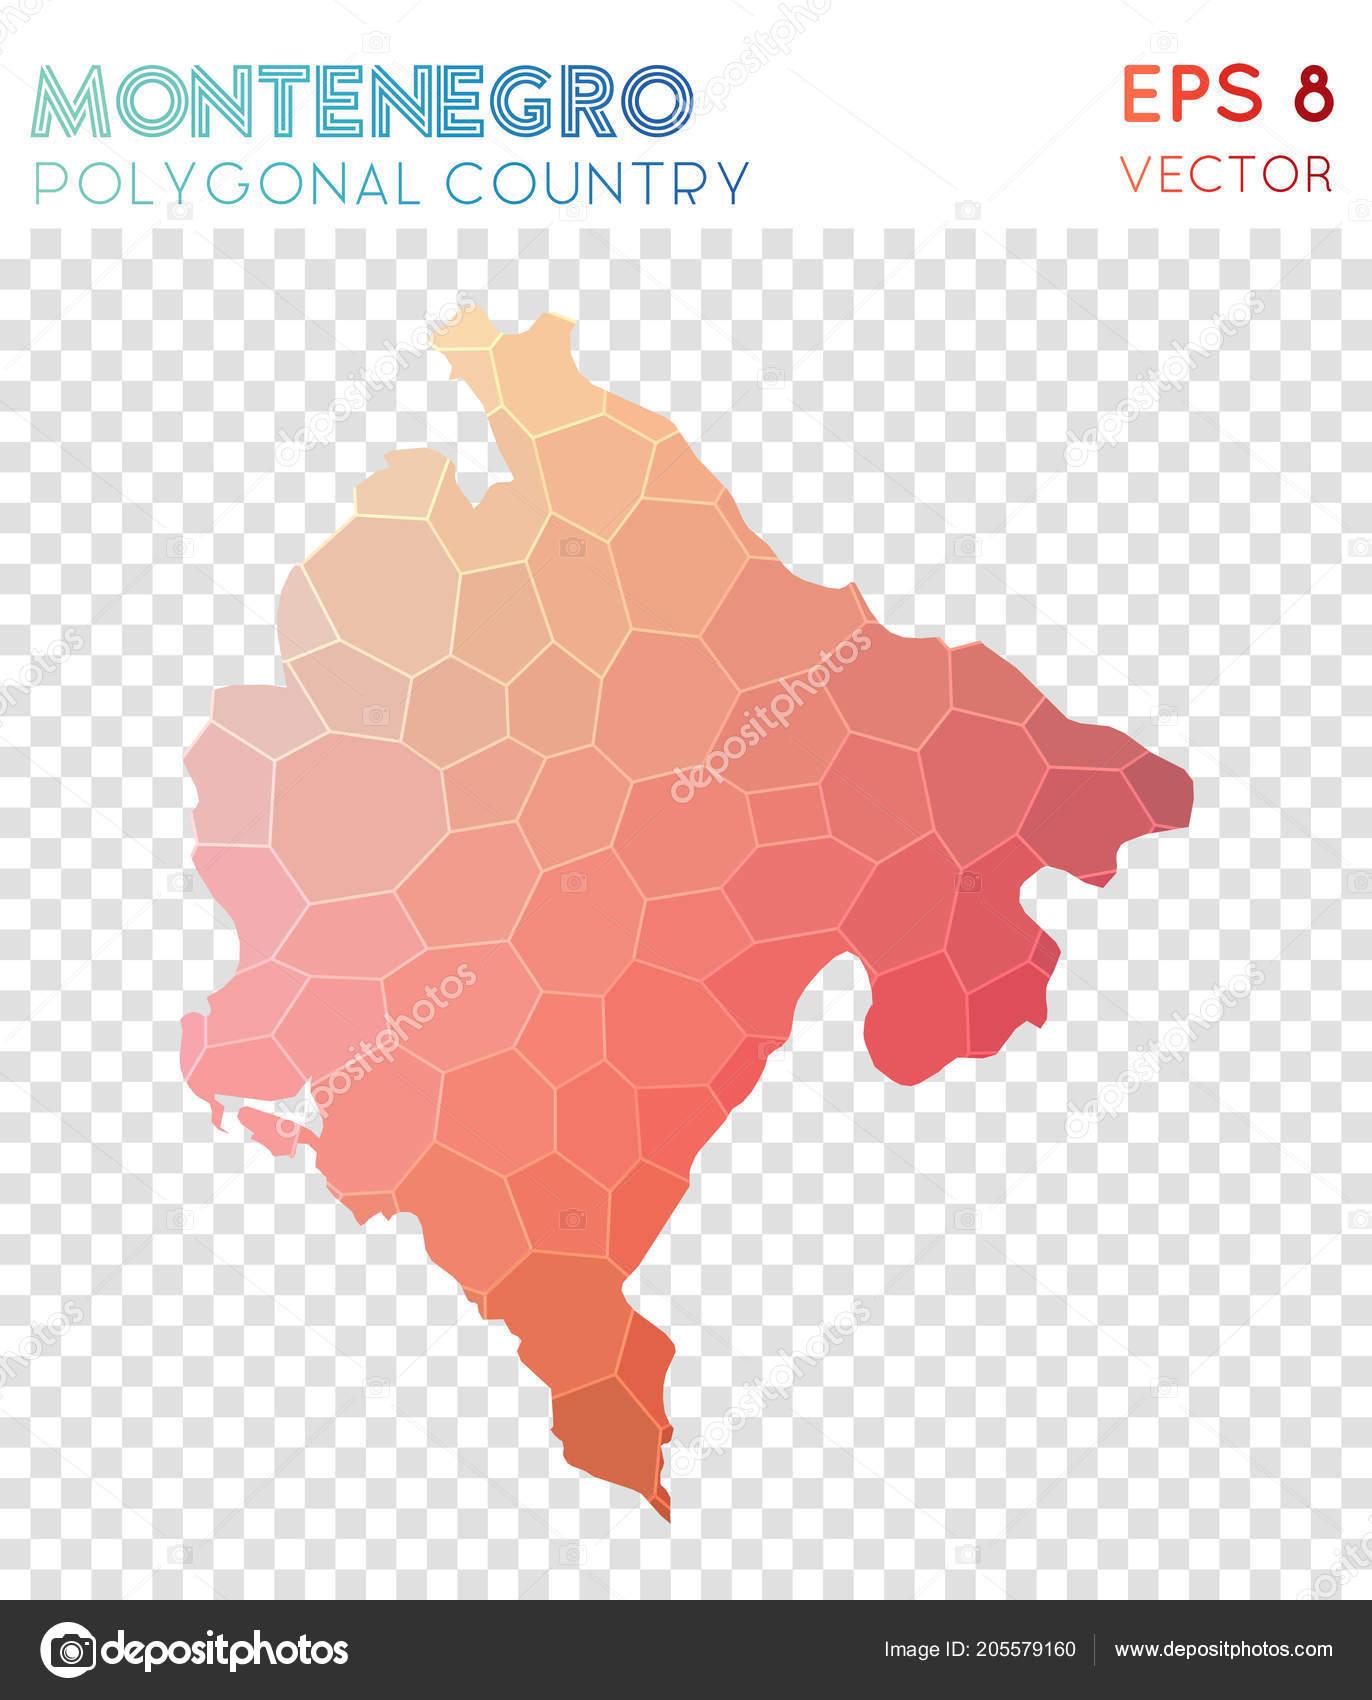 Montenegro Polygonal Map Mosaic Style Country Stunning Low Poly Style  Modern Design Montenegro U2014 Vetor De